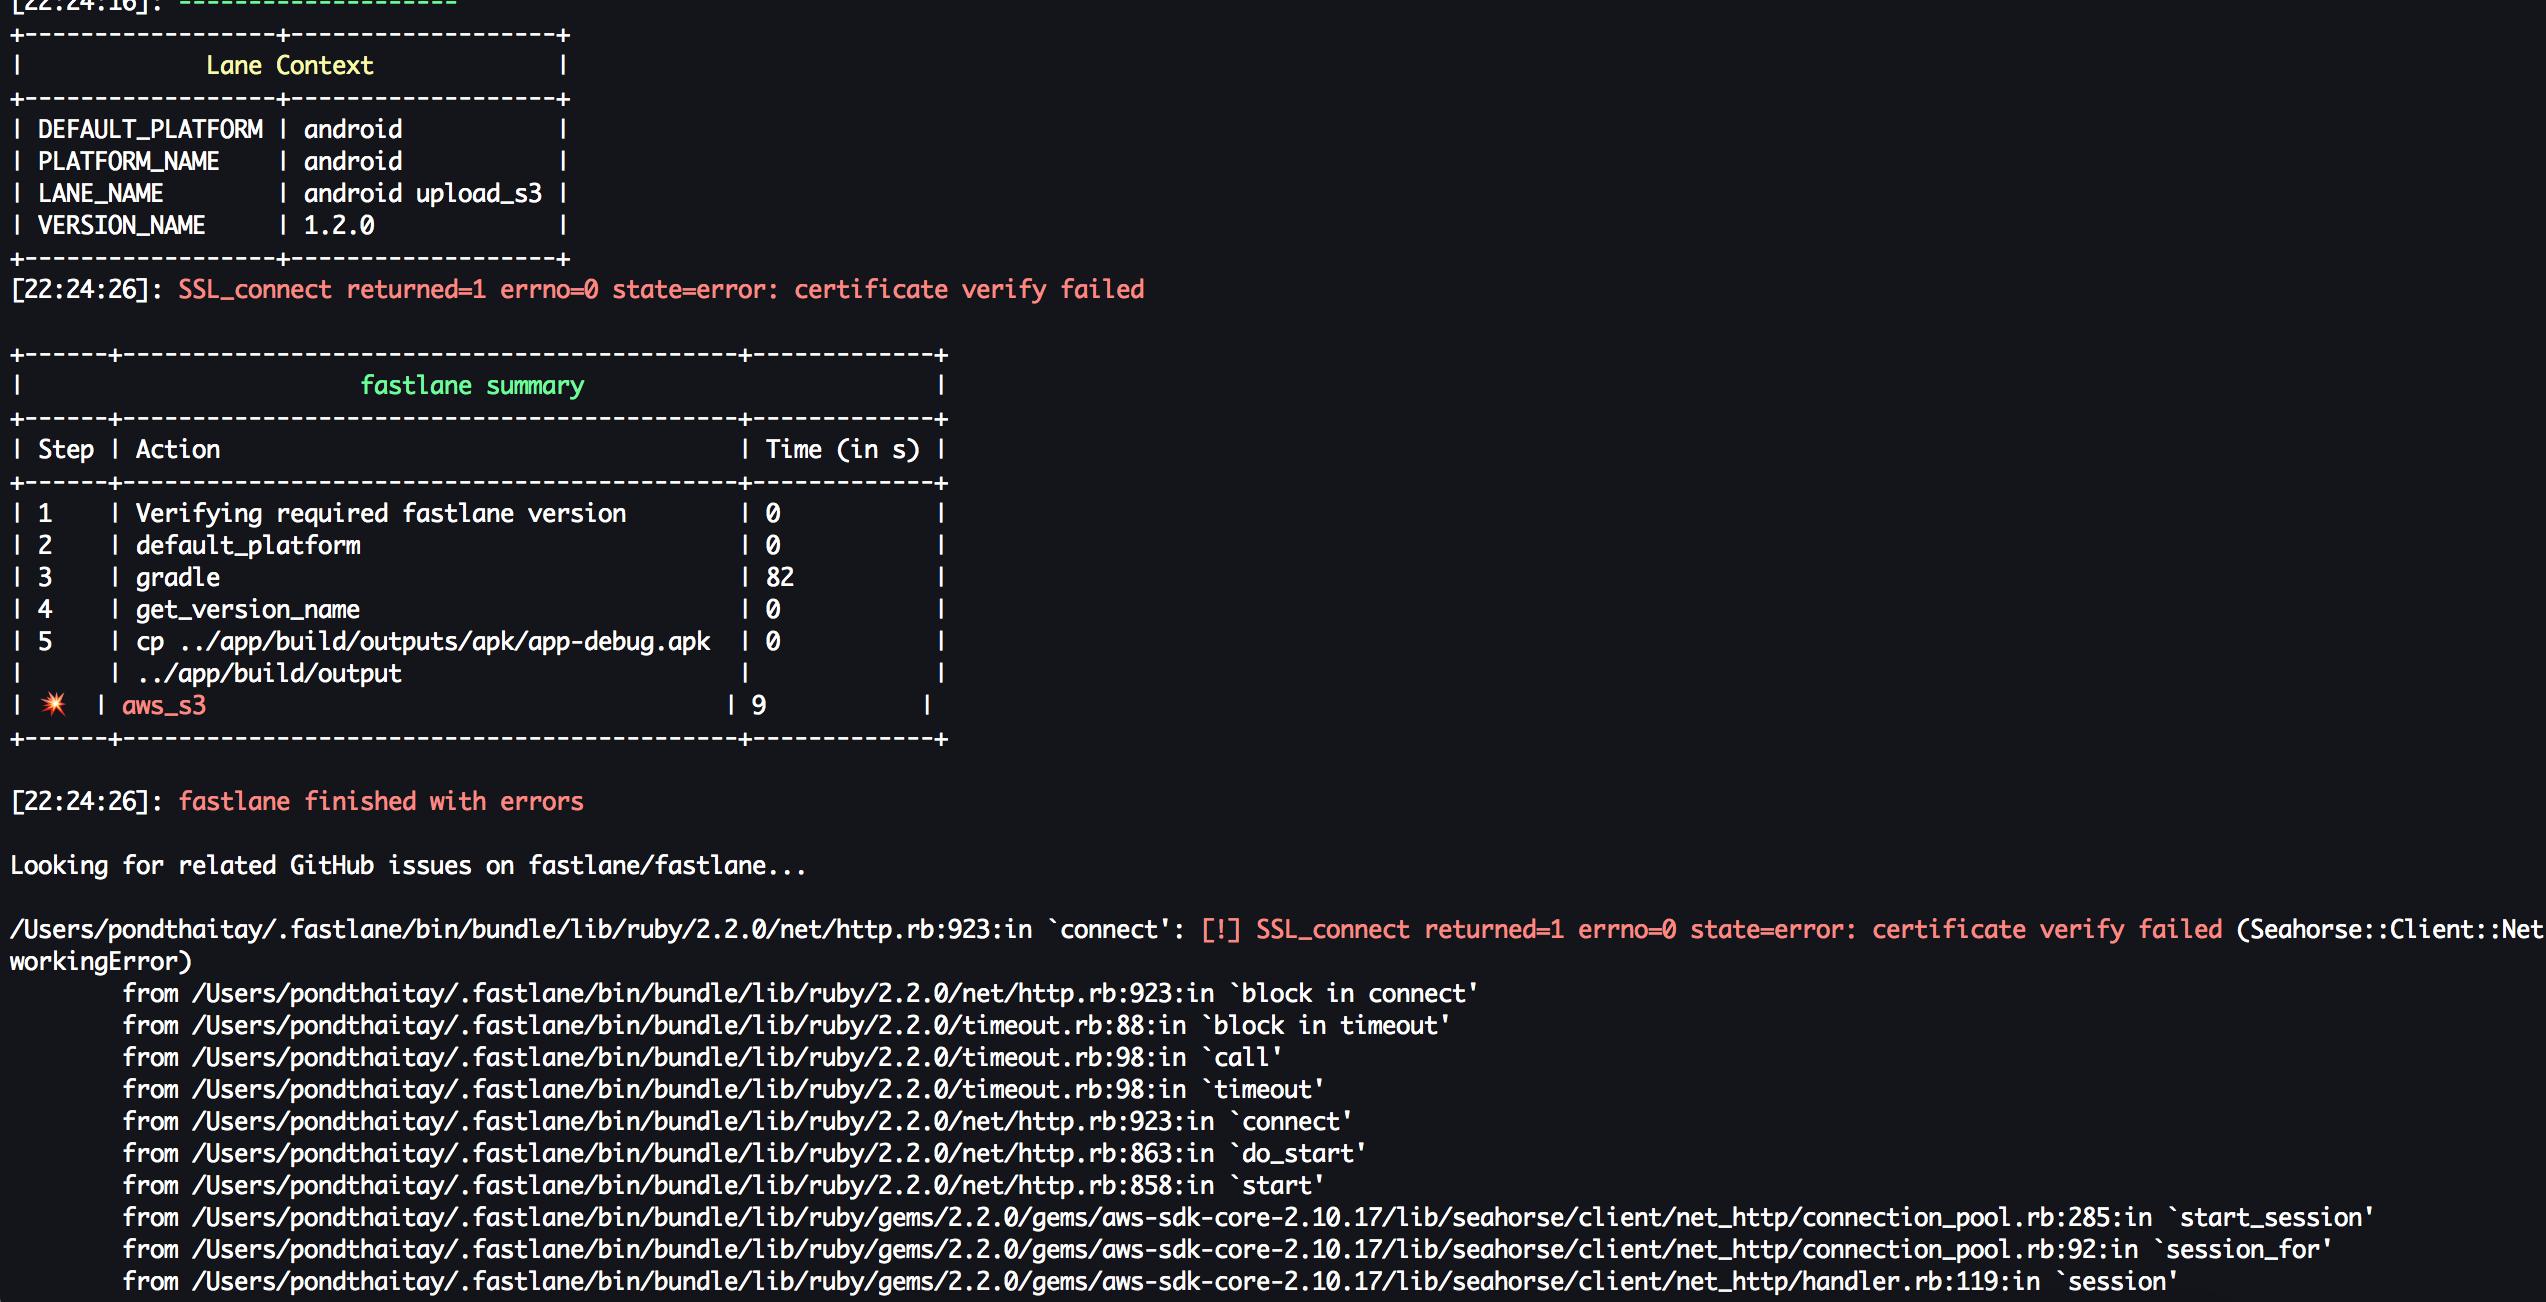 SSL_connect returned=1 errno=0 state=error: certificate